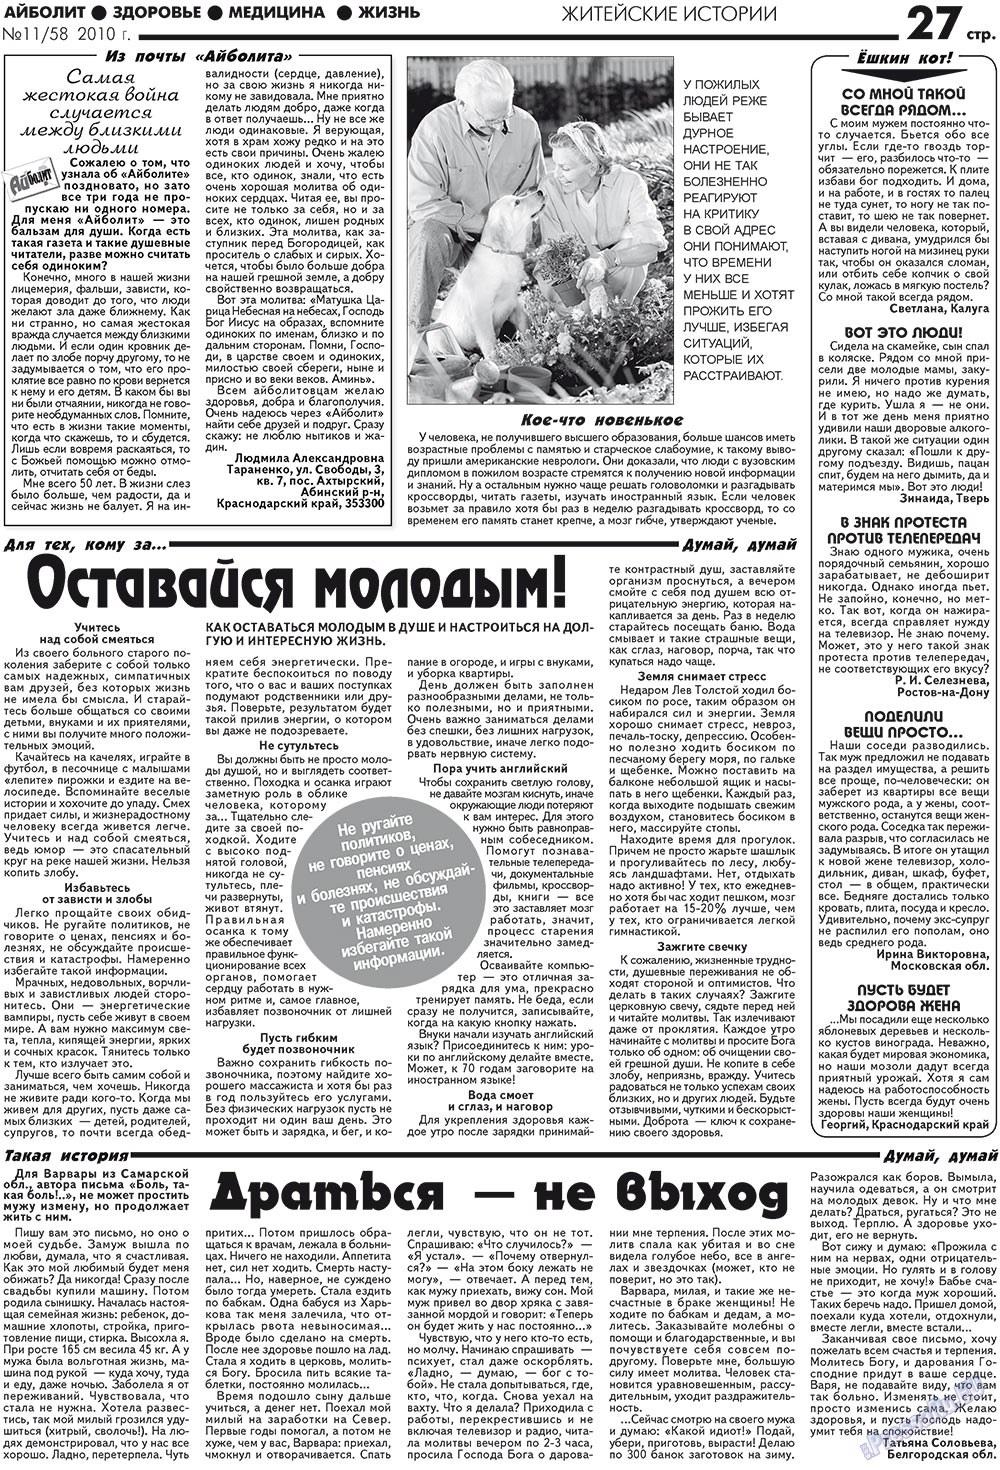 АйБолит (газета). 2010 год, номер 11, стр. 27